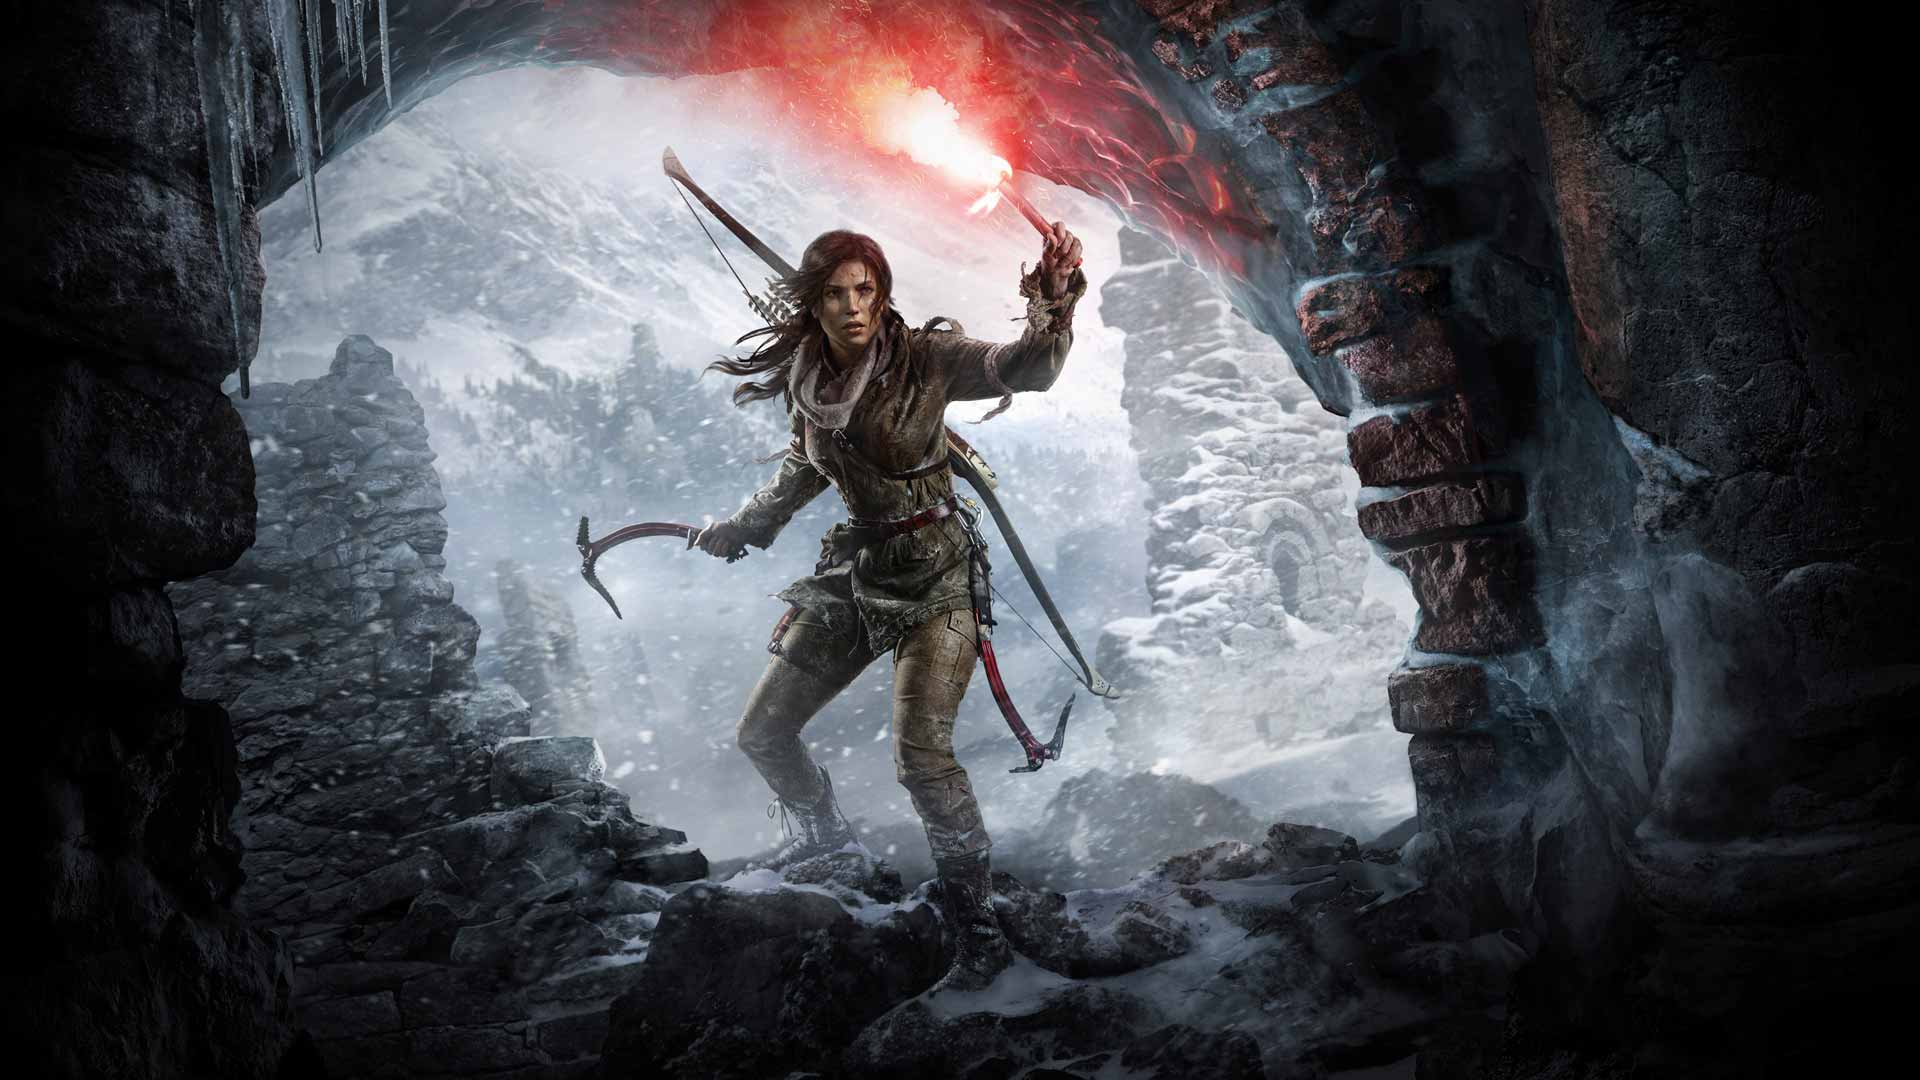 Lara Croft's darkest adventure yet?